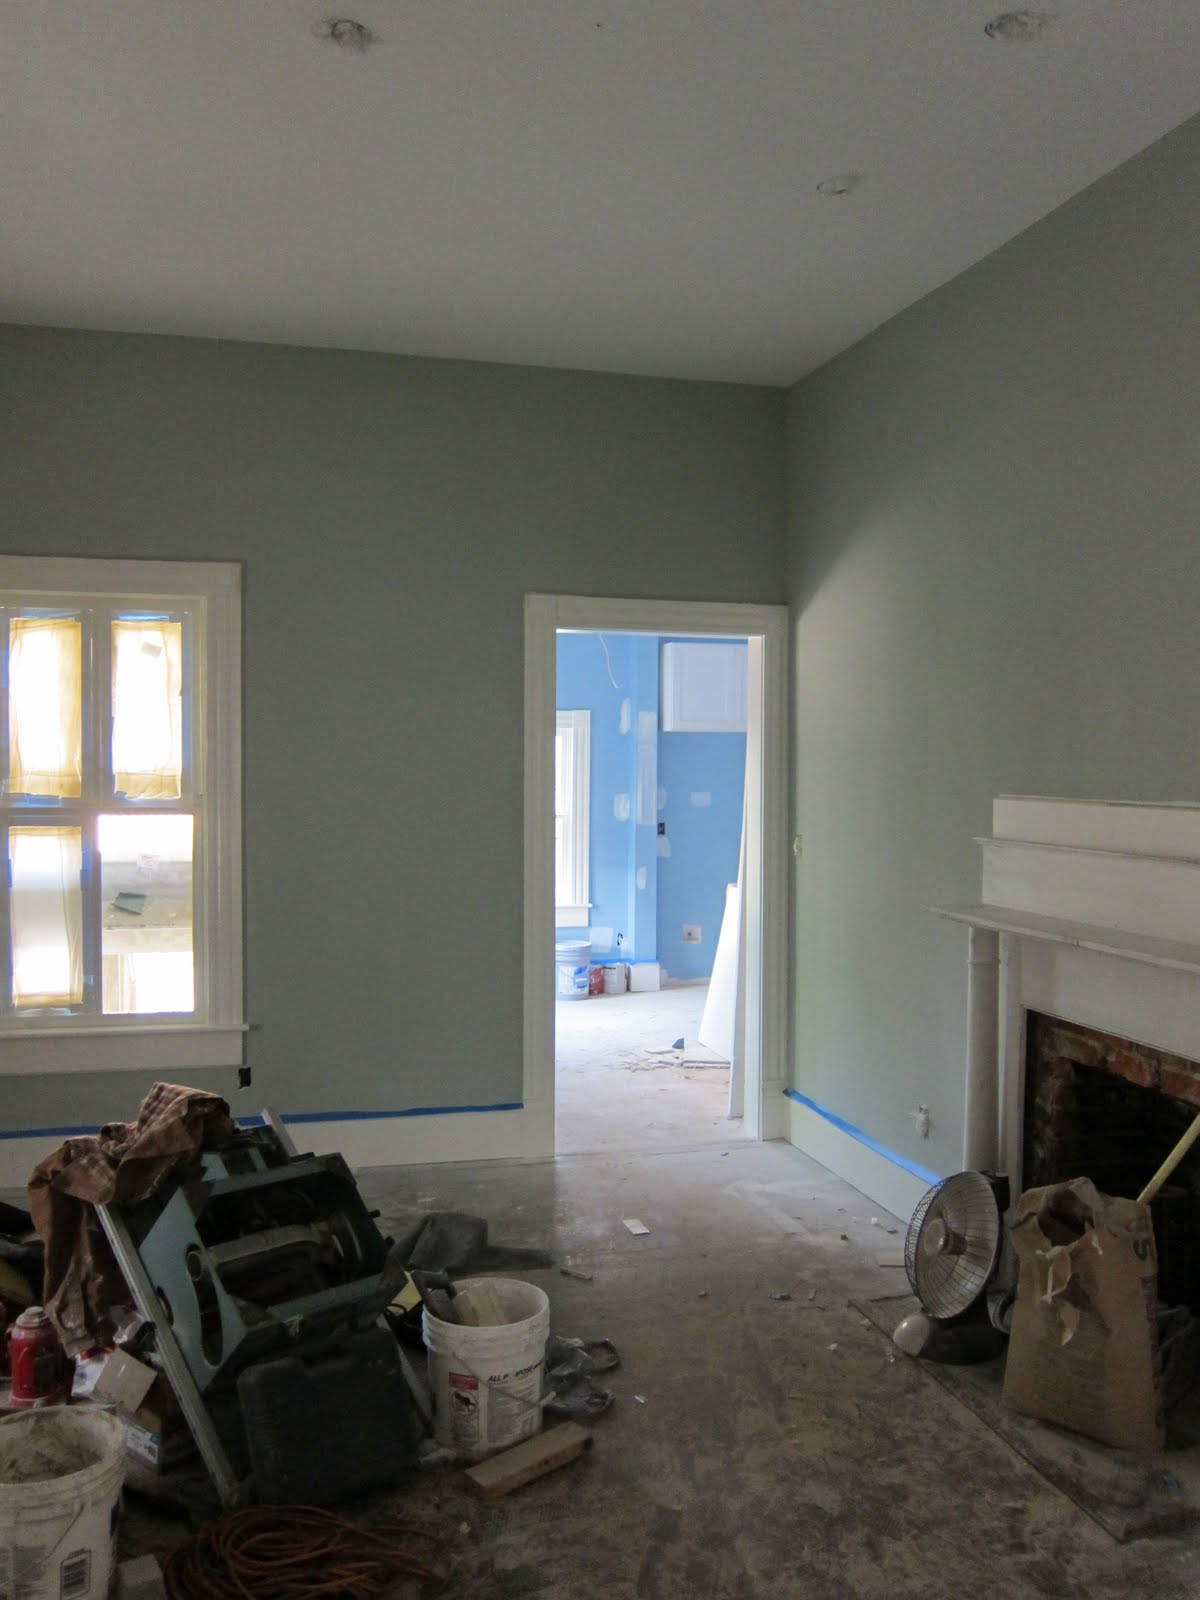 Petty home rainbow bright - Sherwin williams comfort gray living room ...